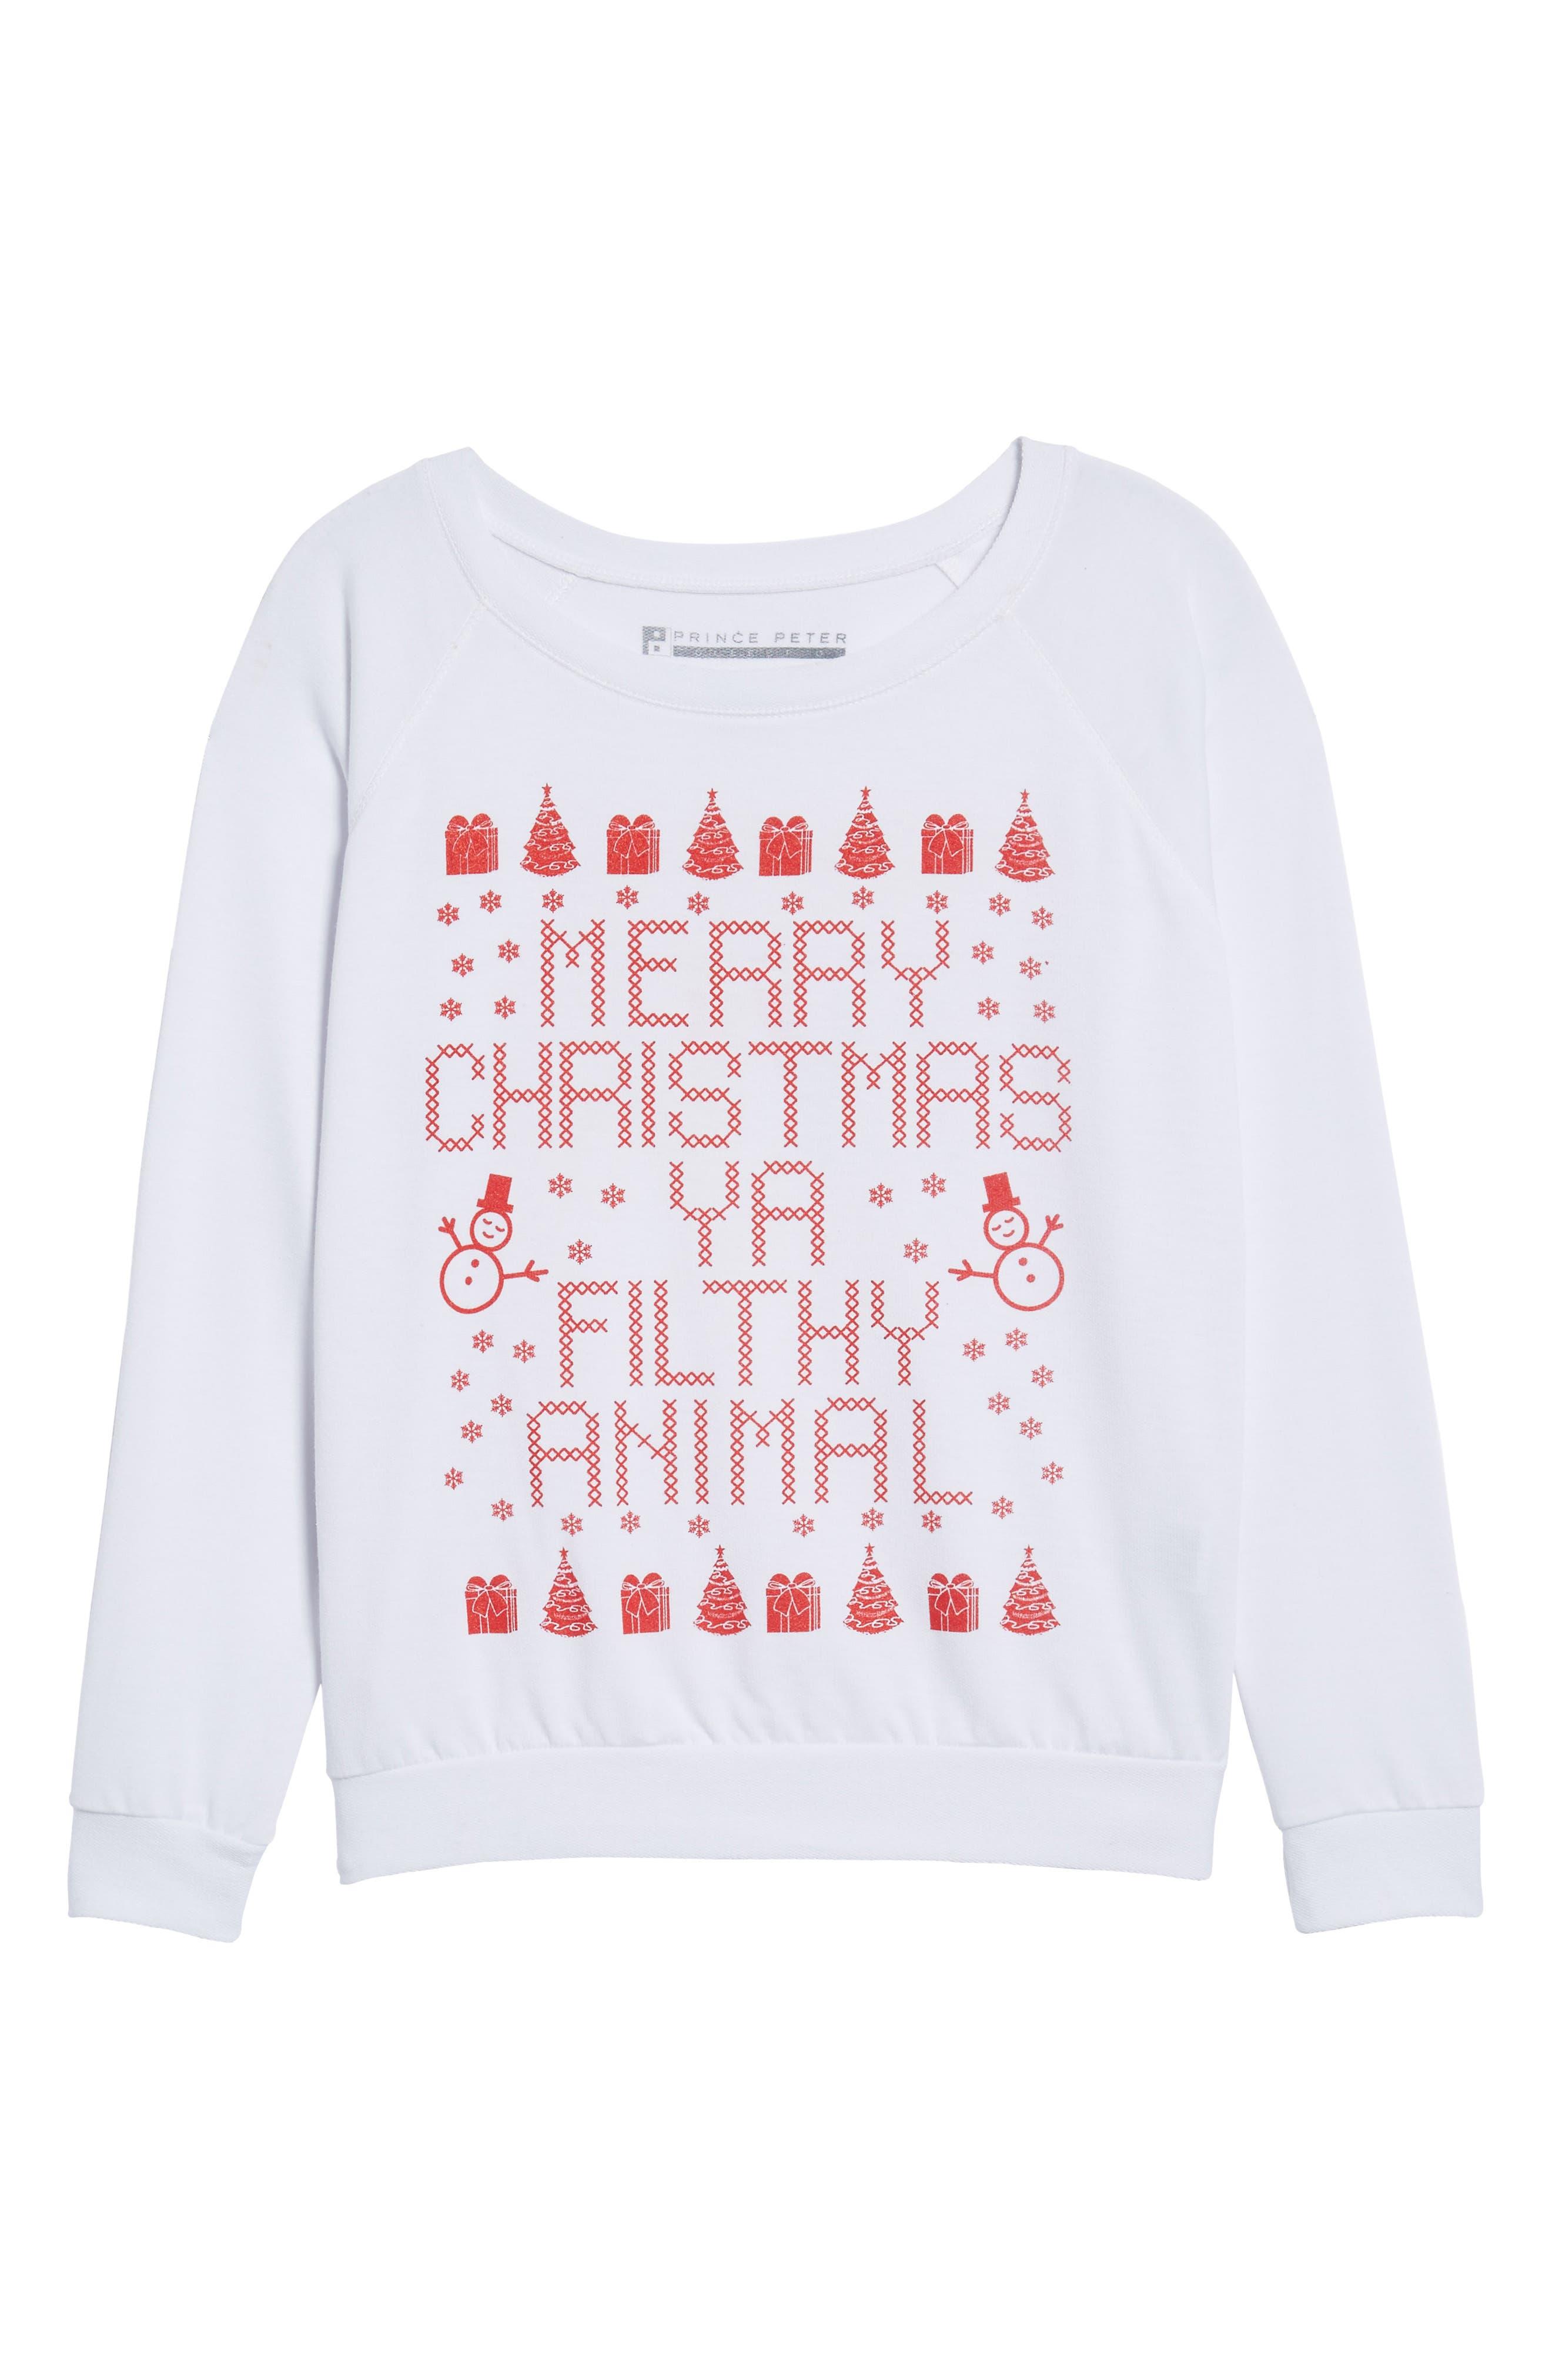 Merry Christmas Ya Filthy Animal Sweatshirt,                             Alternate thumbnail 6, color,                             White